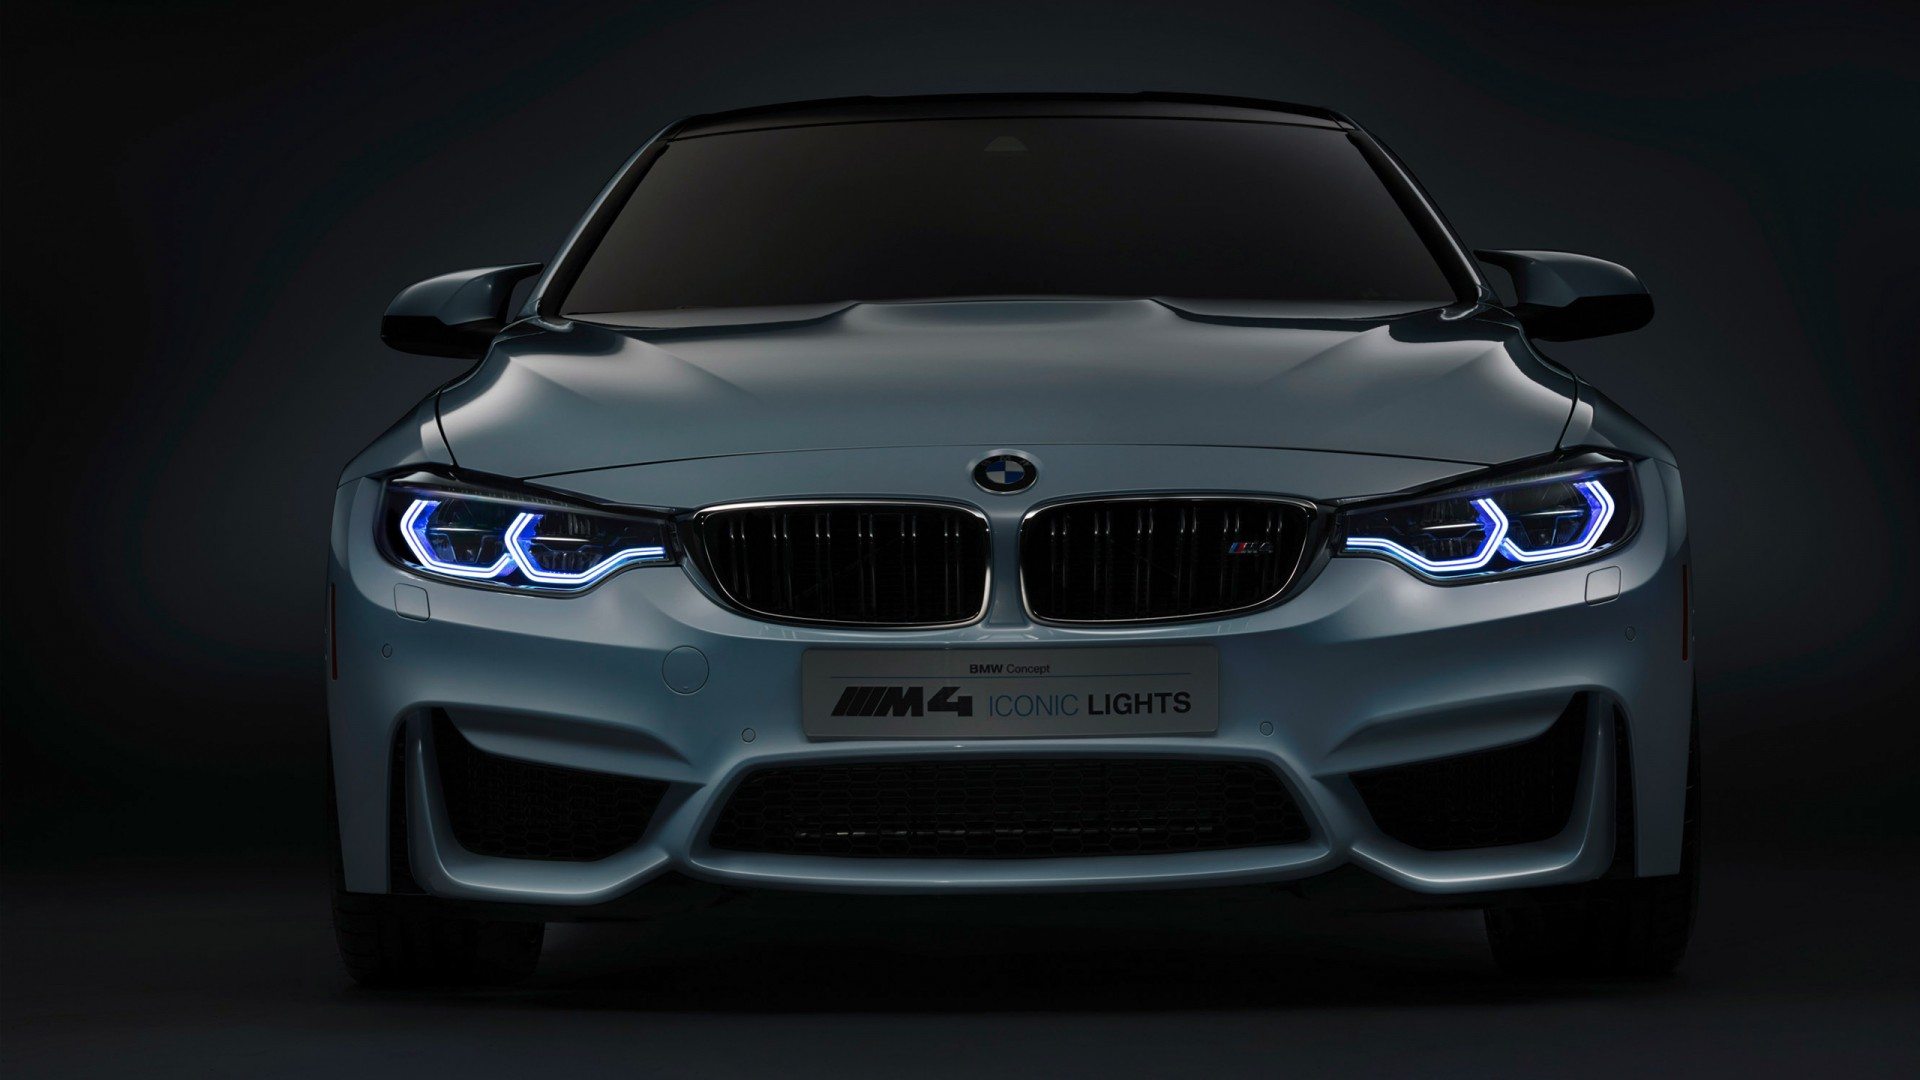 2015 Bmw M4 Concept Iconic Lights Wallpaper Hd Car